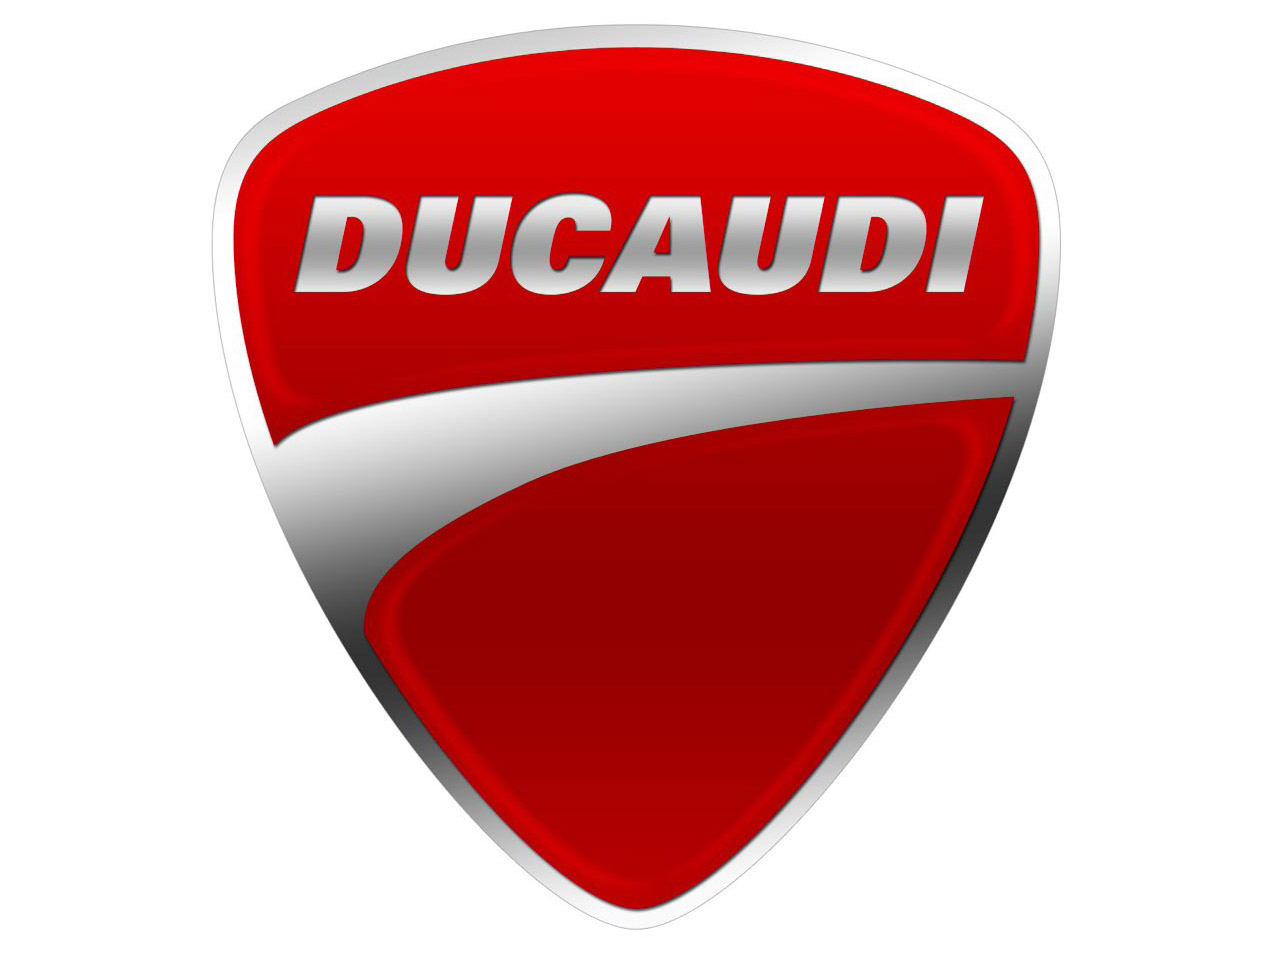 http://blog-imgs-55.fc2.com/m/e/i/meisourider/ducaudi.jpg